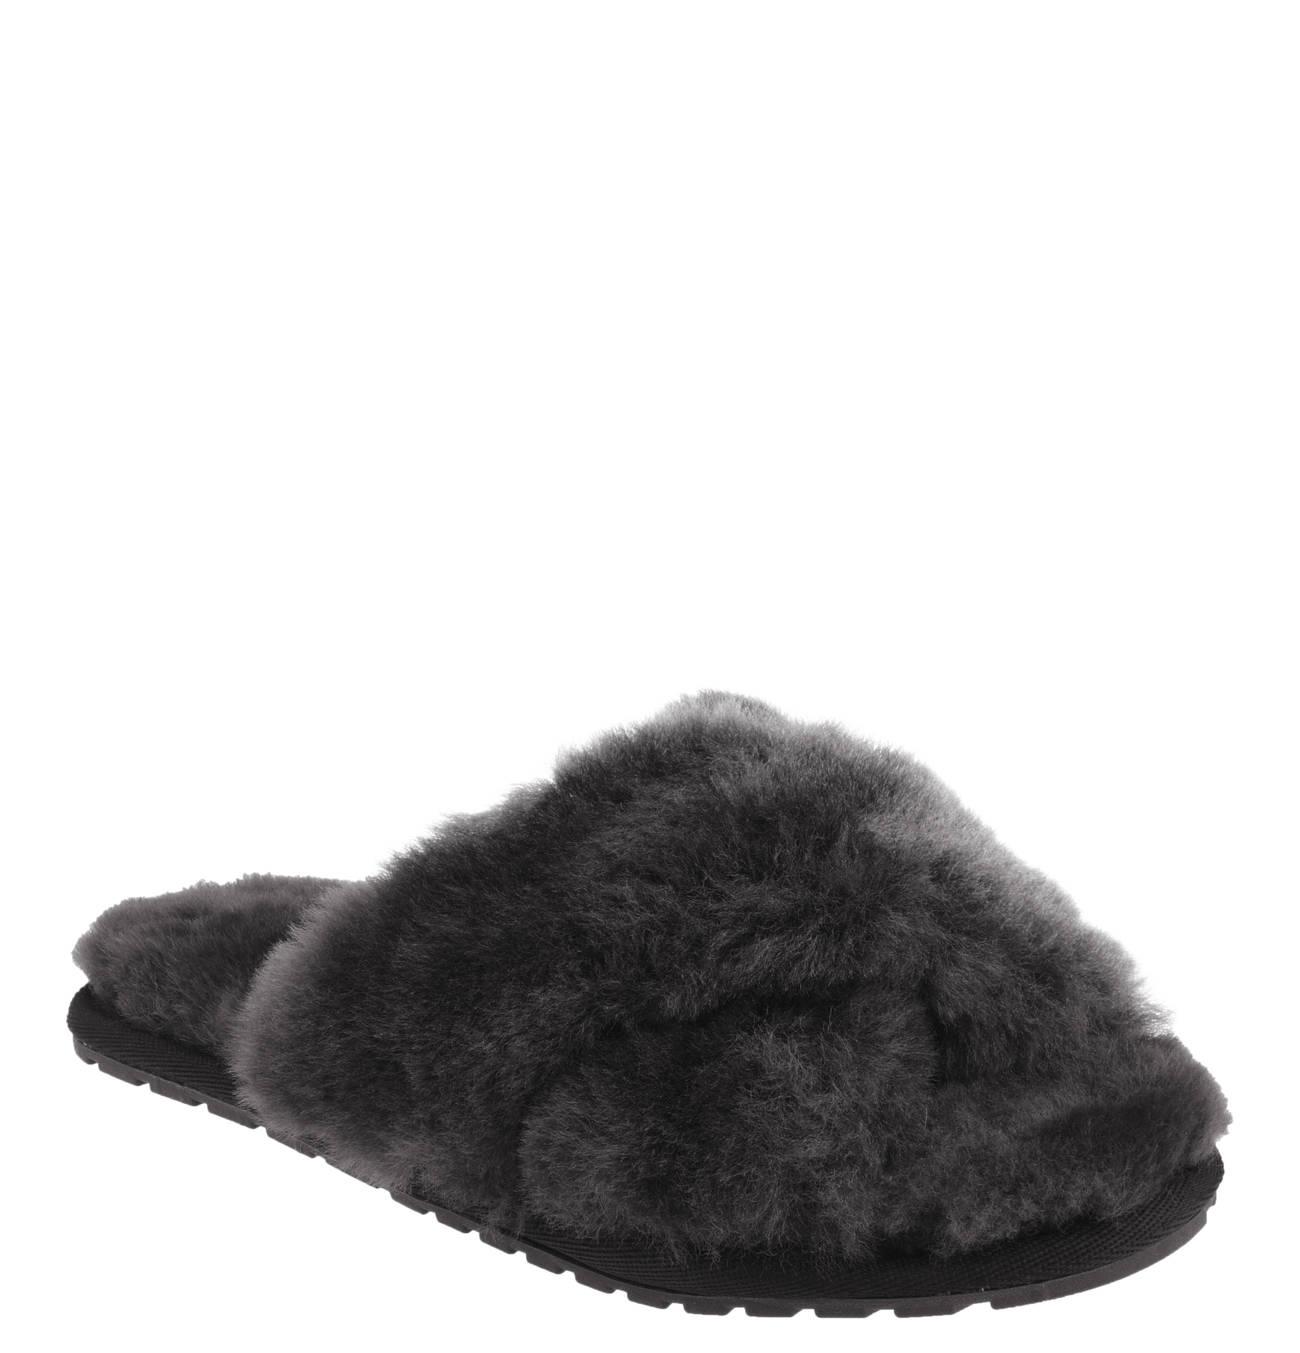 EMU Mayberry Lammfell Hausschuhe günstig kaufen | limango